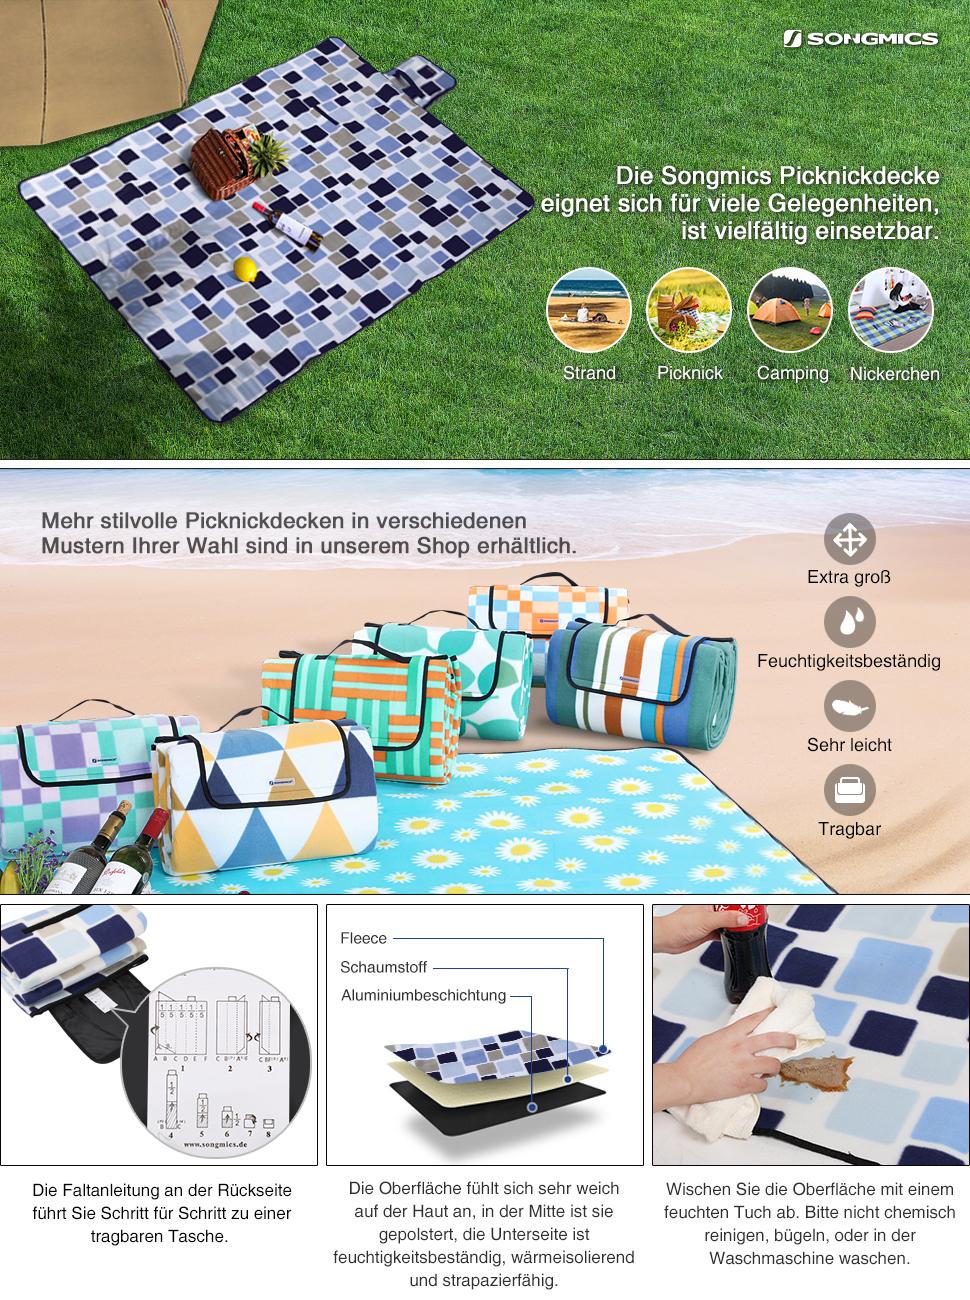 songmics 200 x 200 cm xxl picknickdecke fleece wasserdicht gcm71l garten. Black Bedroom Furniture Sets. Home Design Ideas